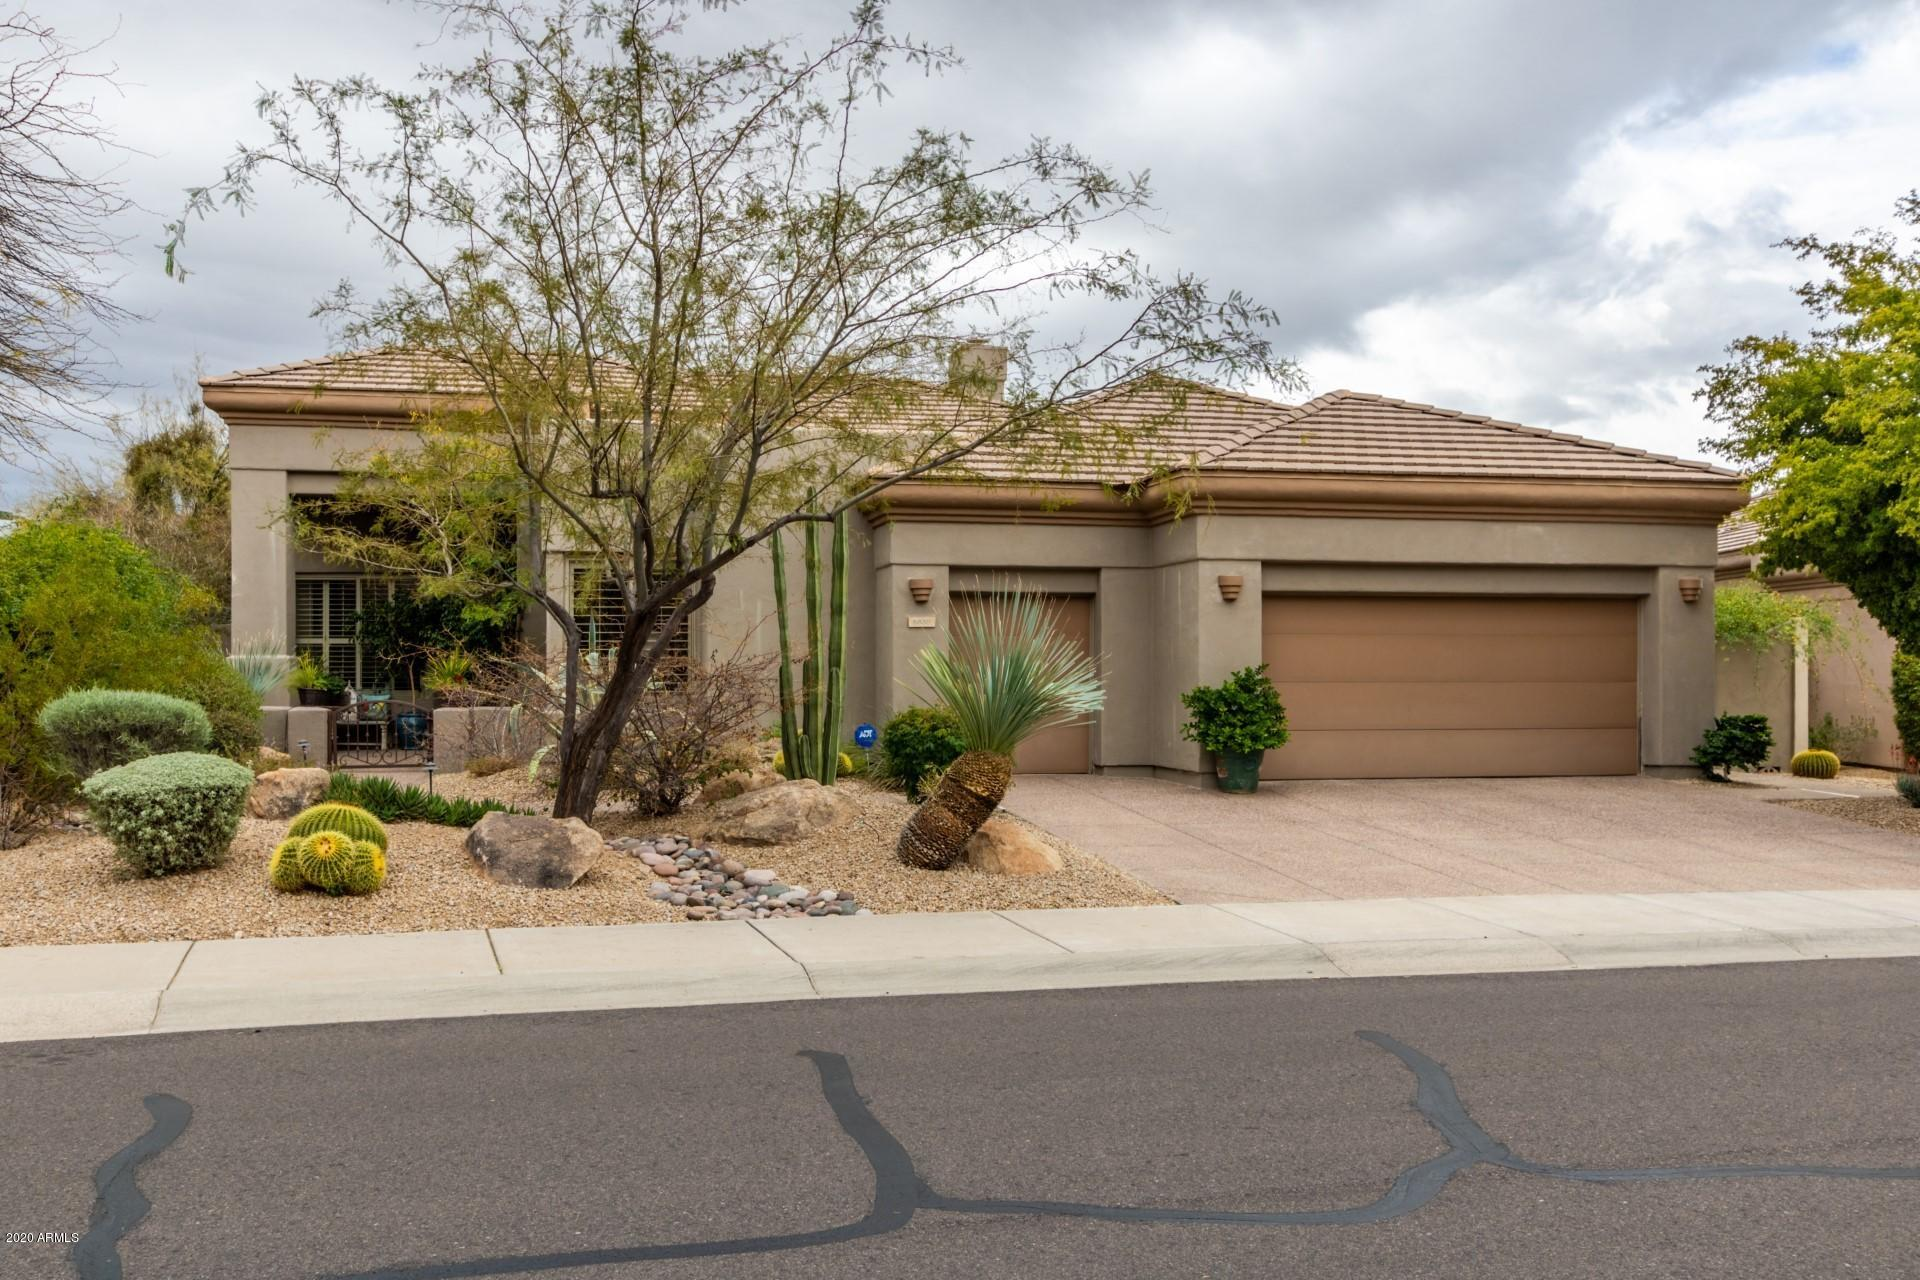 Photo of 6839 E AMBER SUN Drive, Scottsdale, AZ 85266